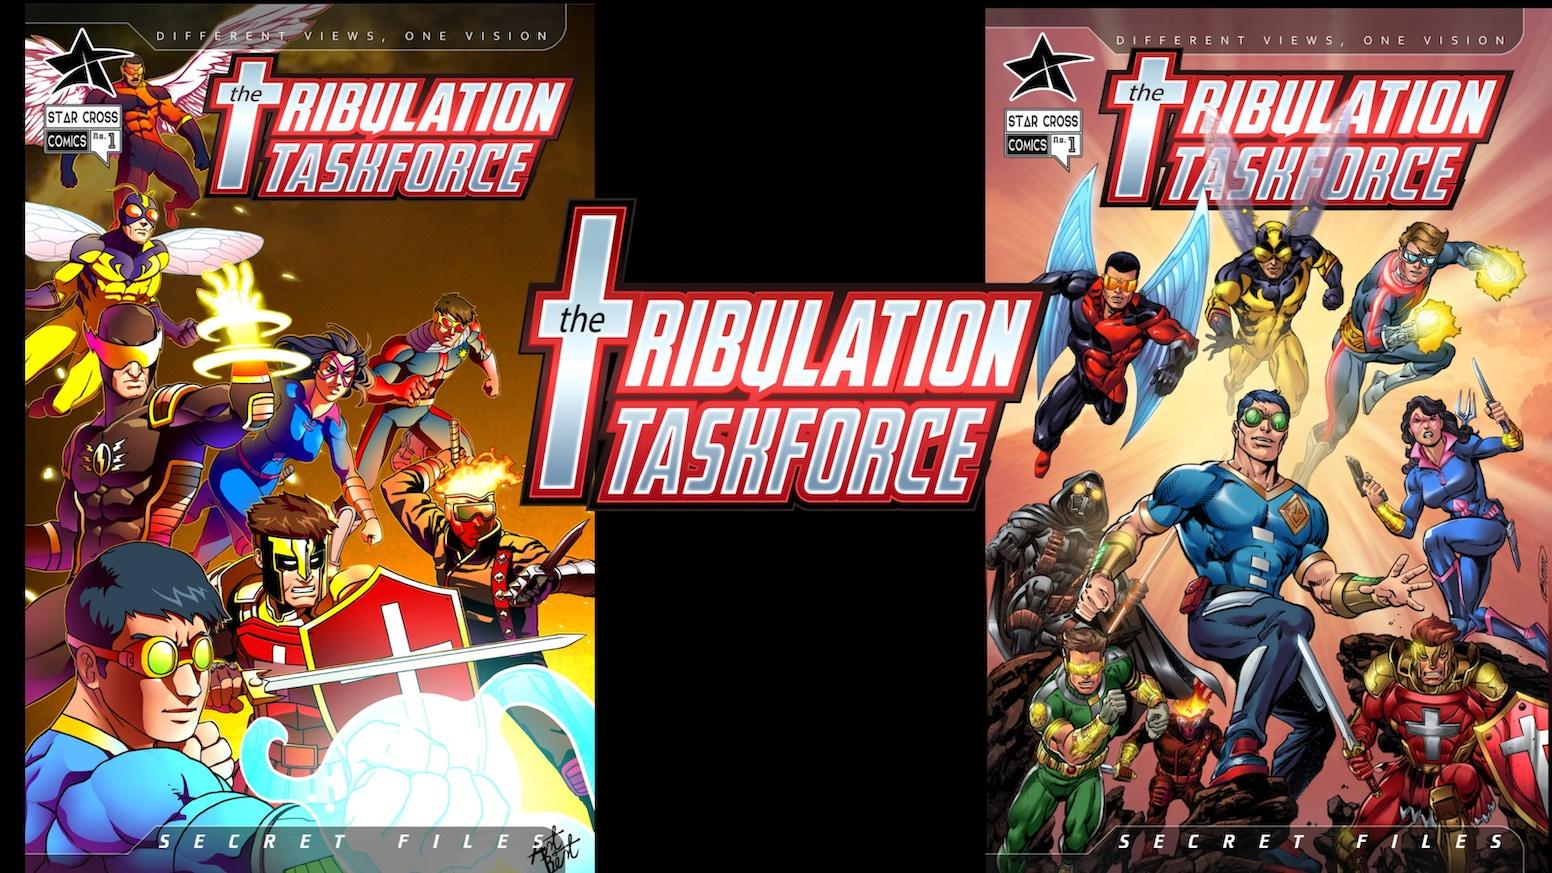 The final era of the Heroic Age...The Tribulation Taskforce!